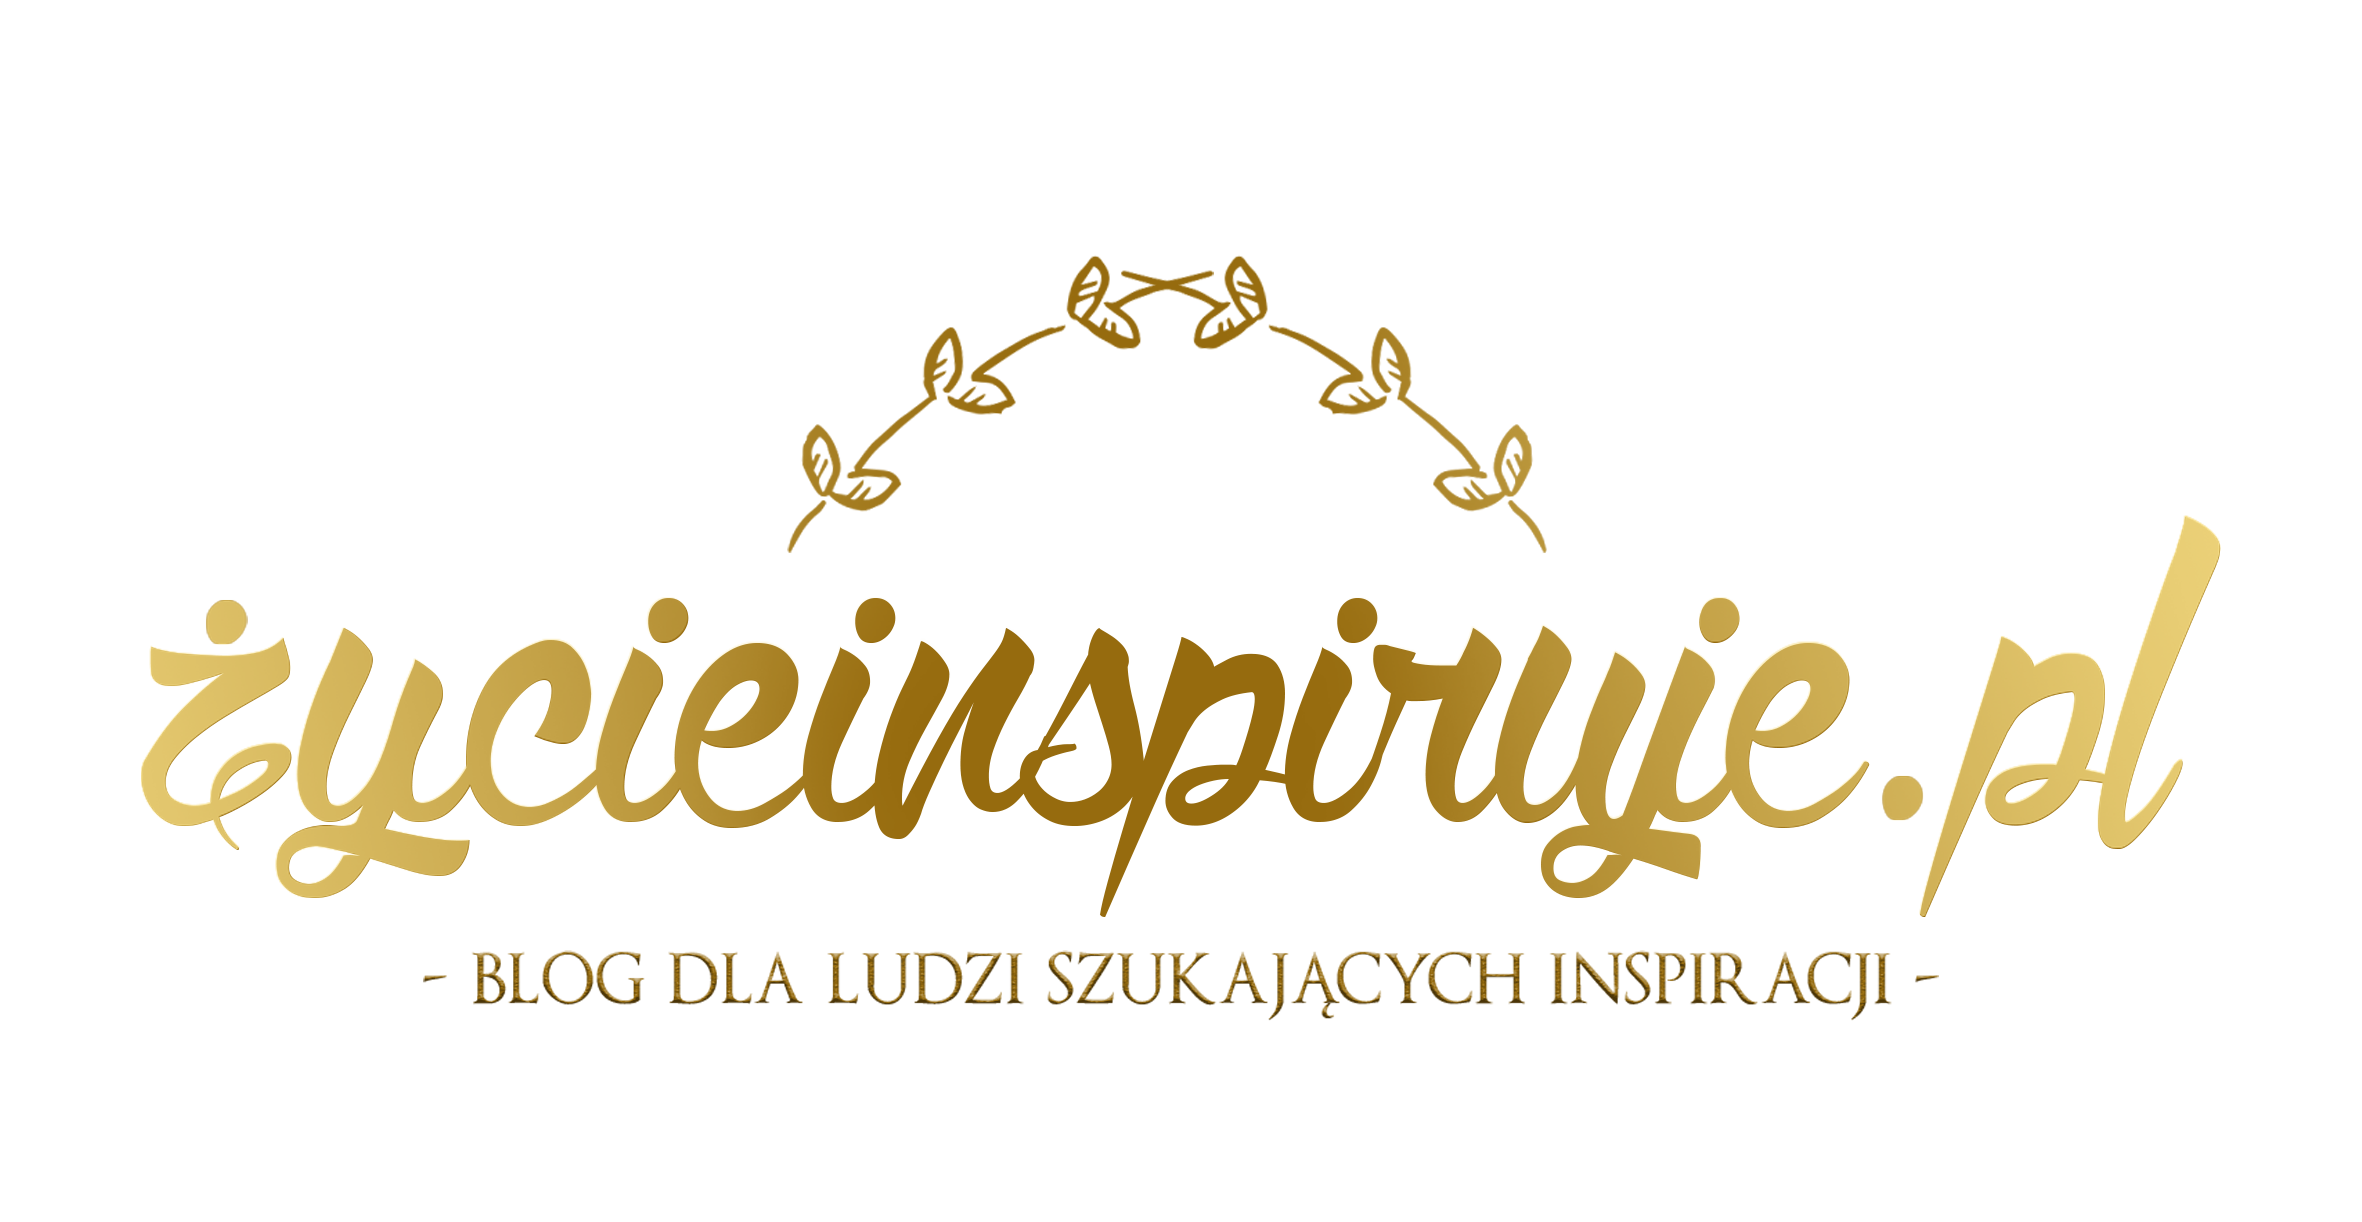 Blog życieinspiruje.pl